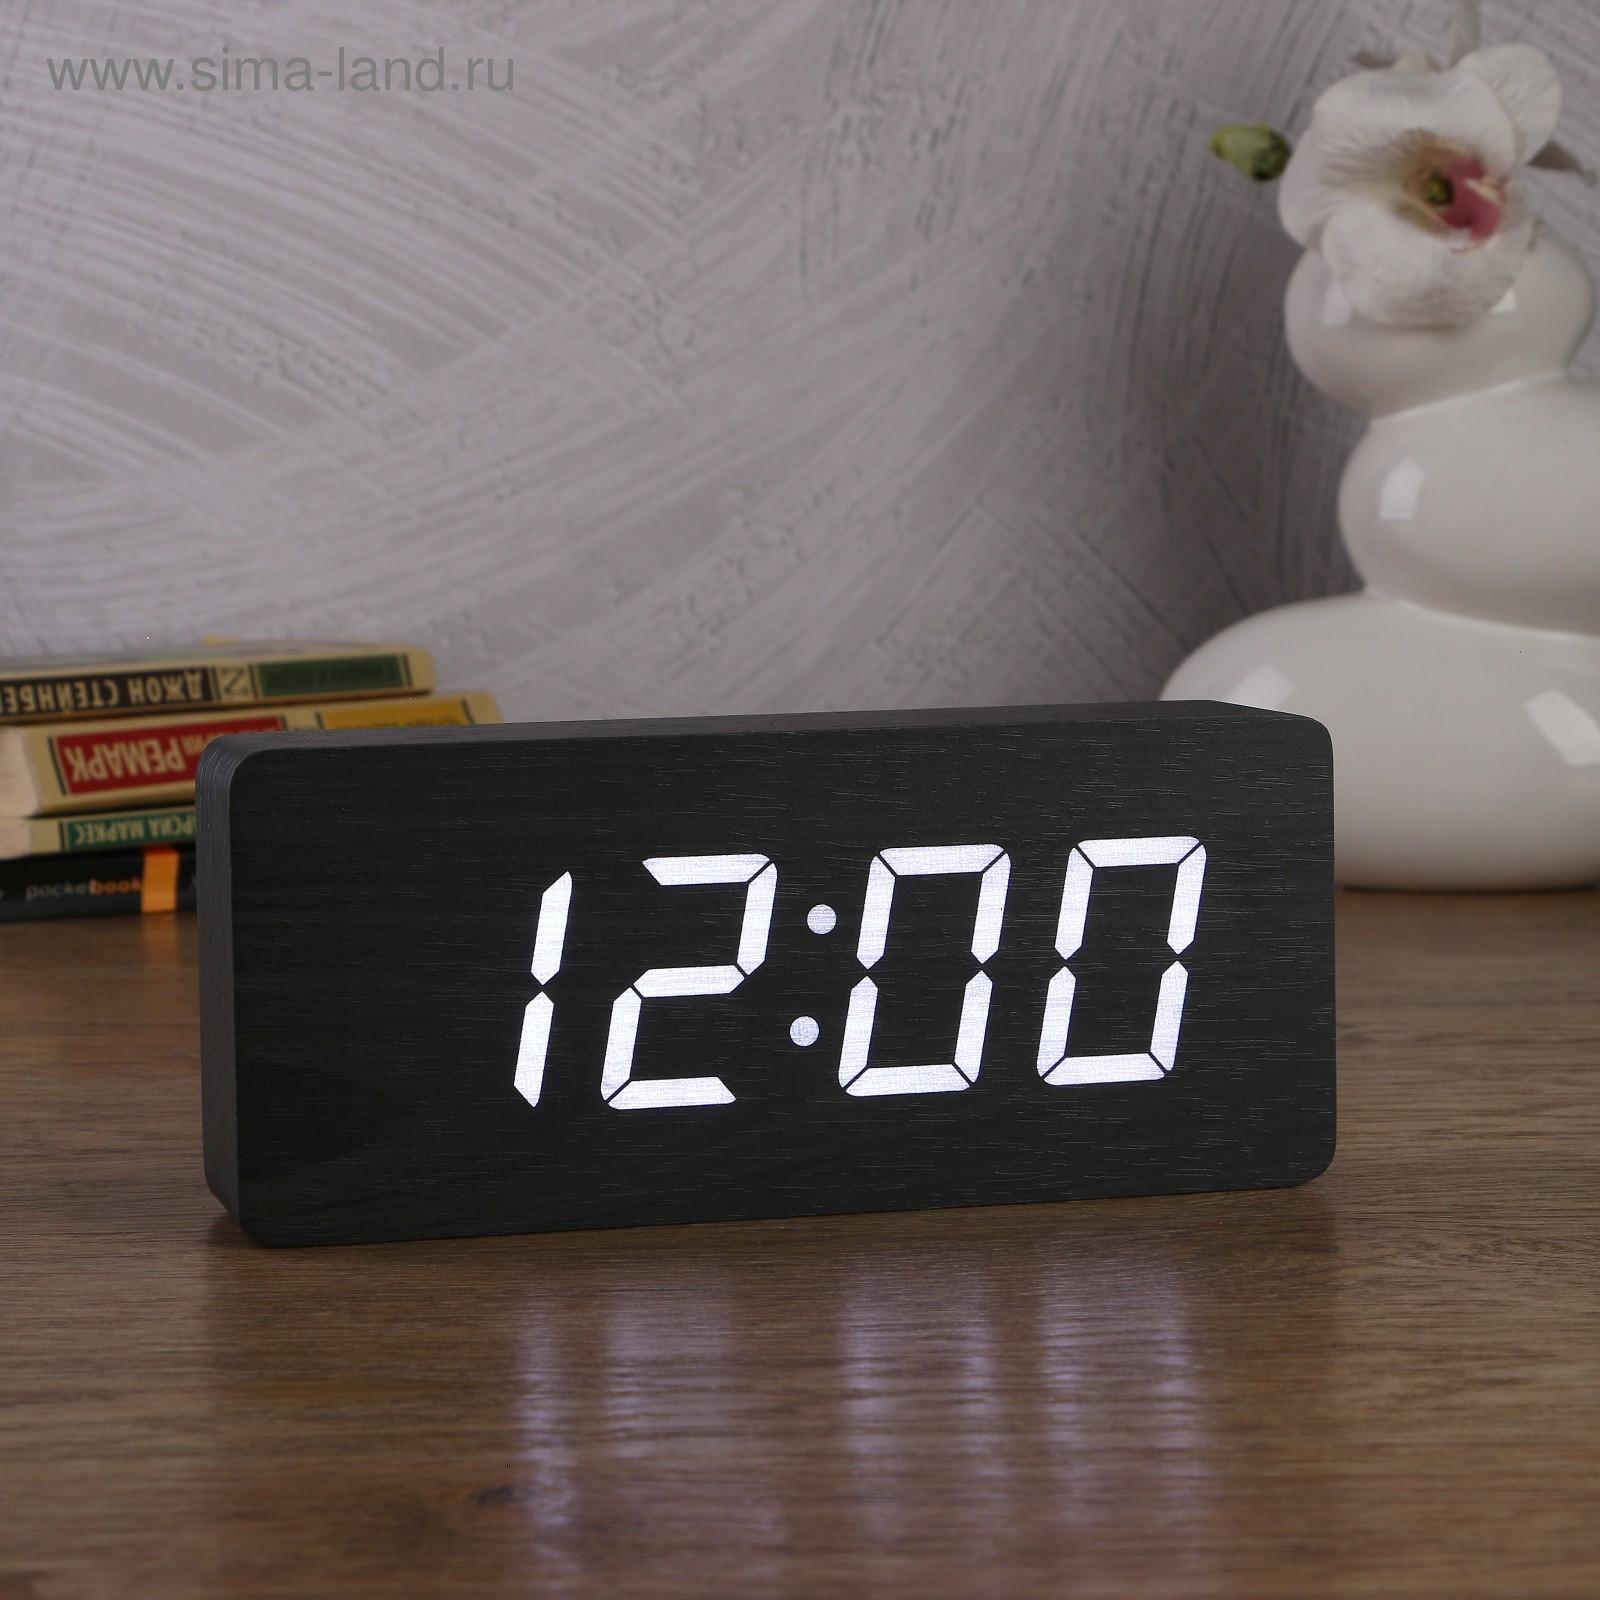 d5e35e12 Часы-будильник электронные, с термометром, белые цифры, 21х9х5 см ...